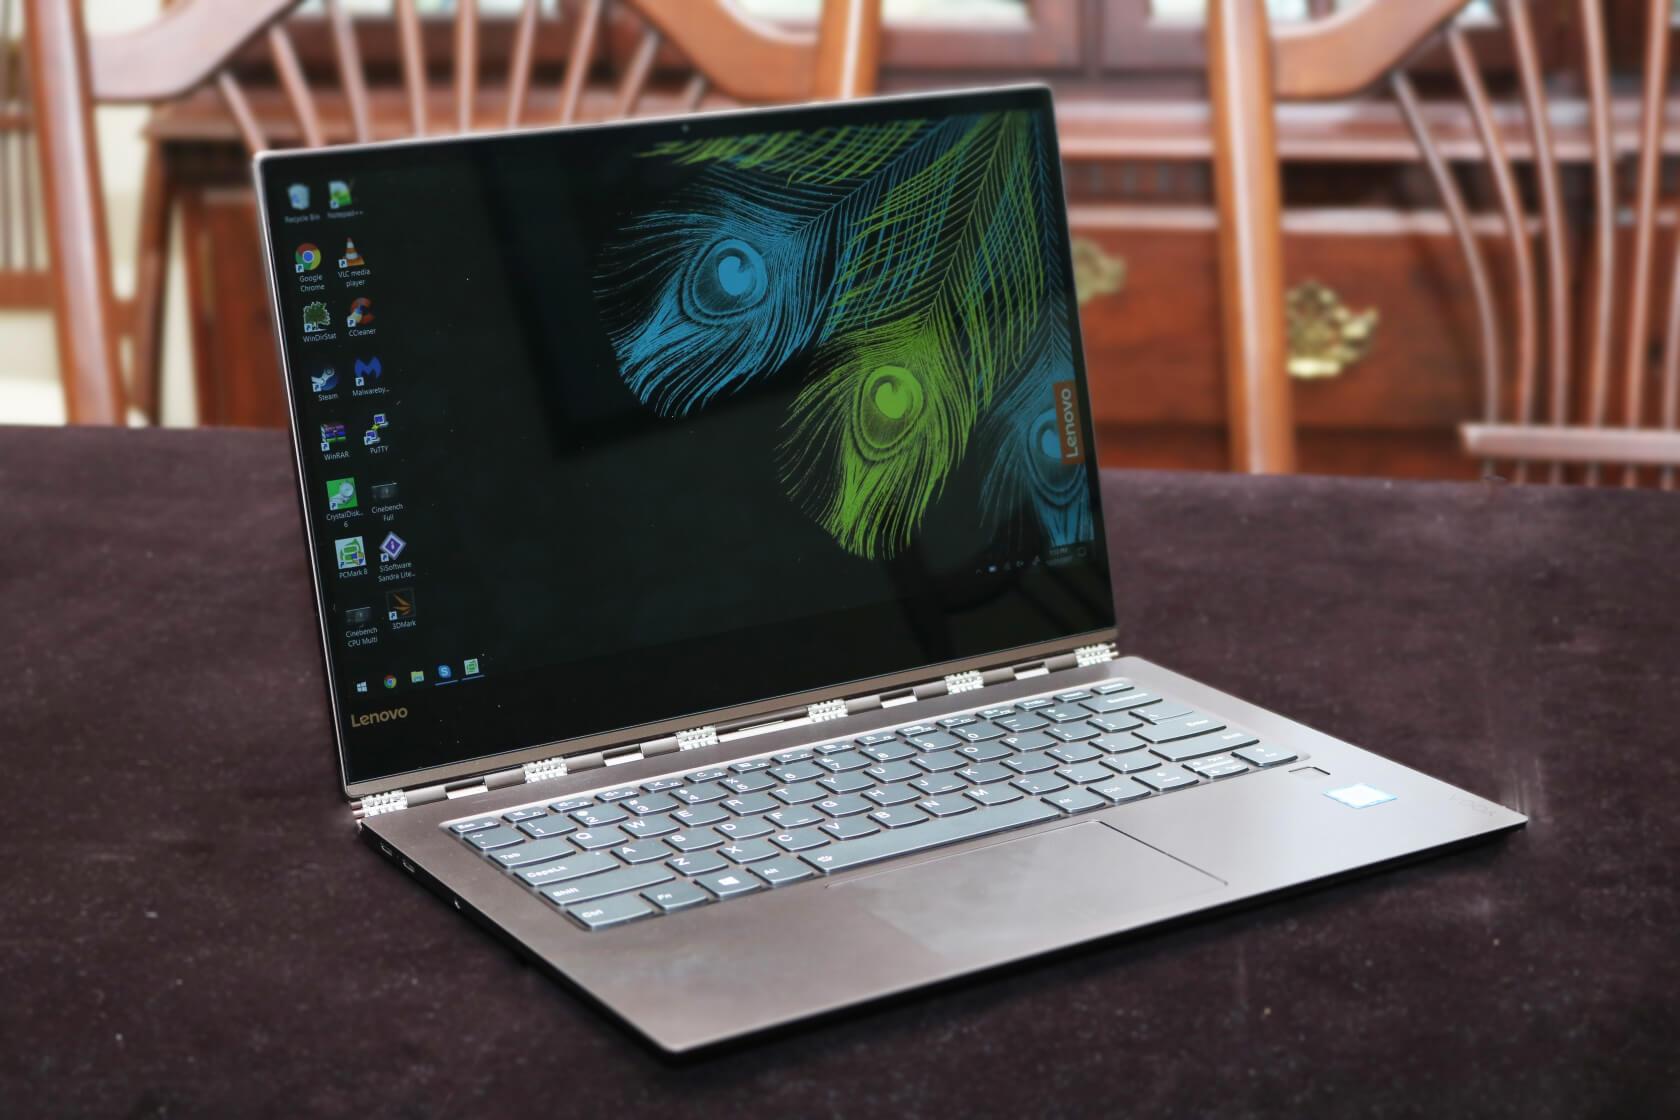 Lenovo Yoga 920 2 In 1 Laptop Review Photo Gallery Techspot